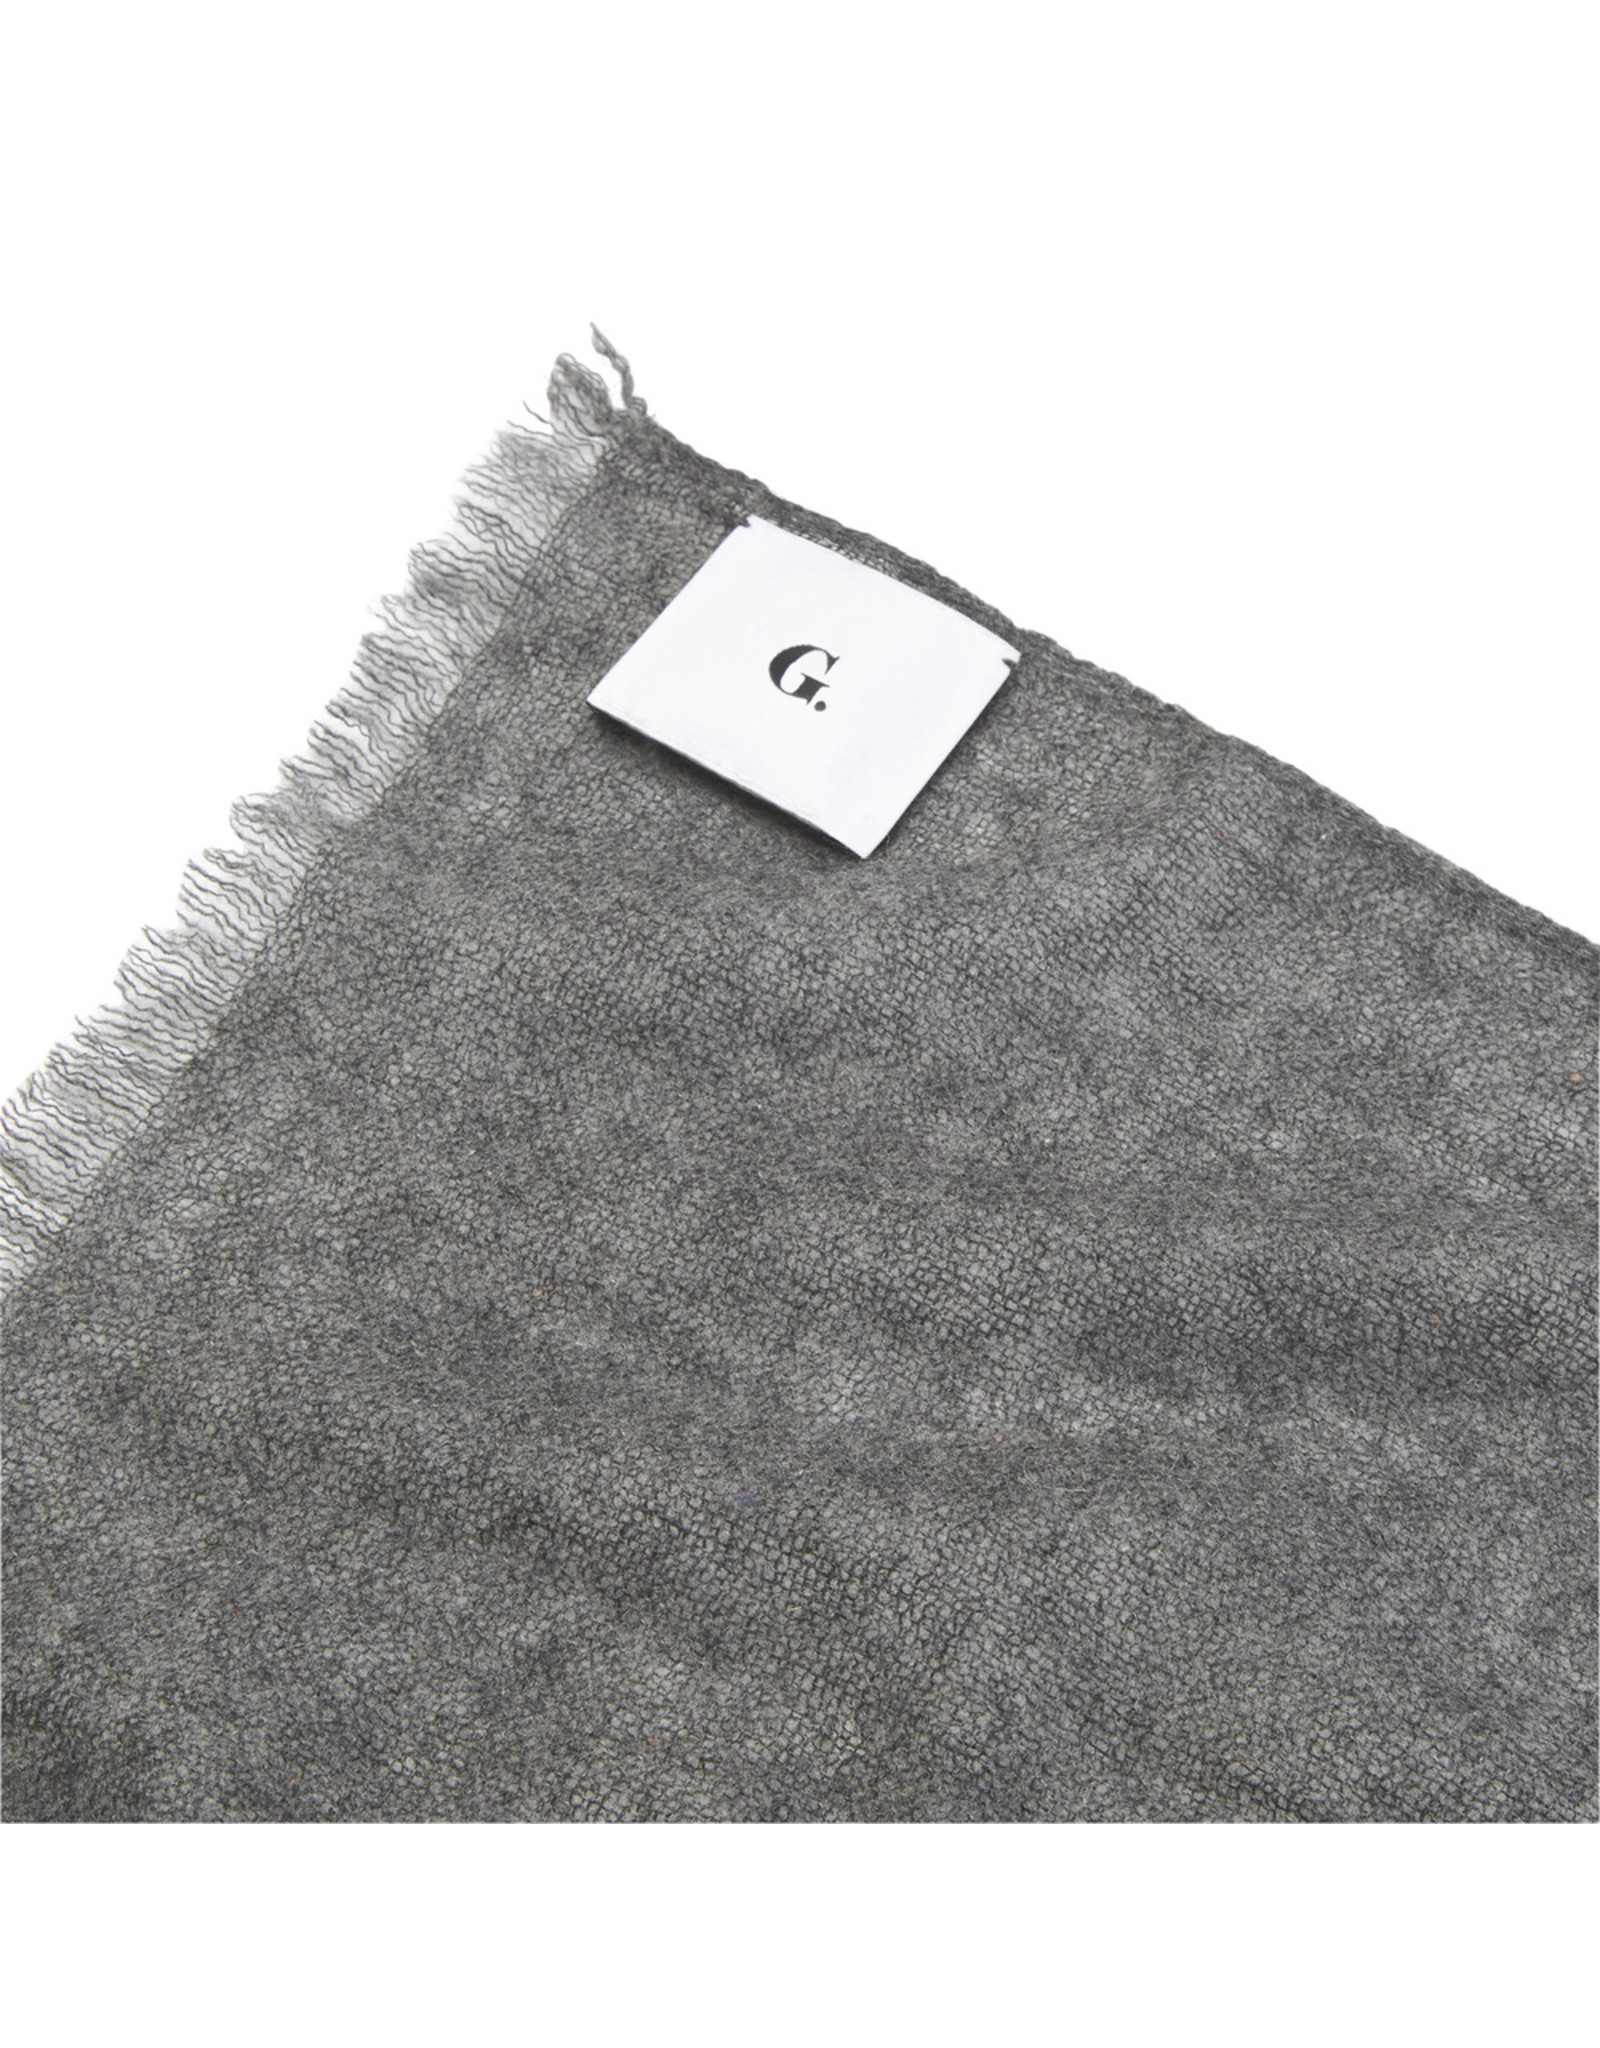 G. Label G. Label Caroline Cashmere Wrap (Color: Heather Grey)